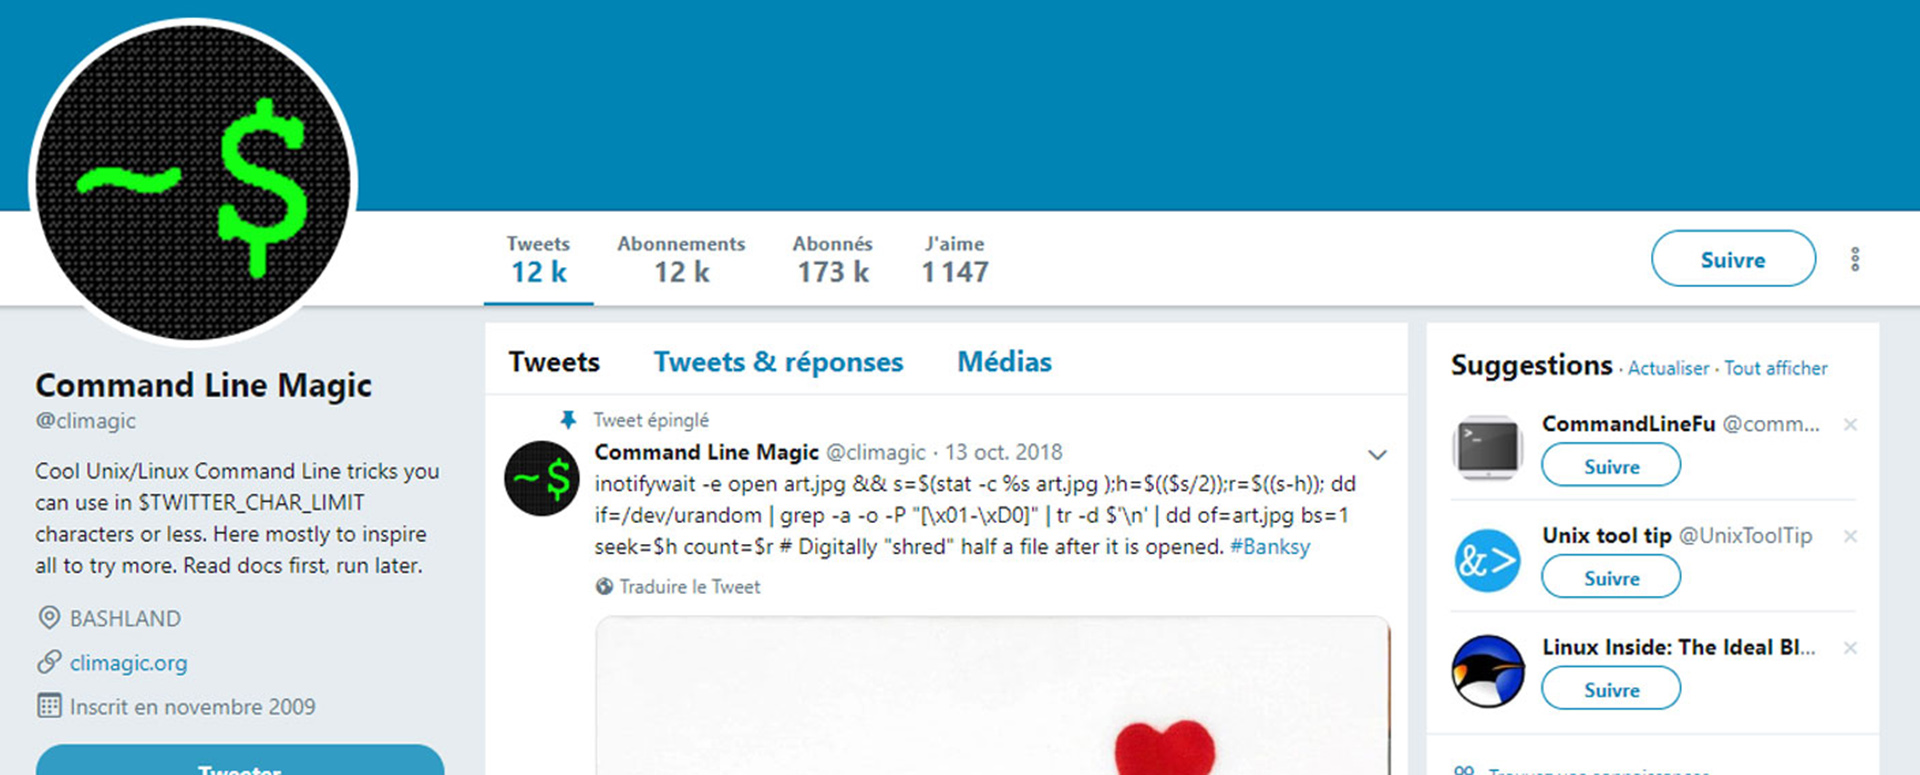 Compte twitter Command Line Magic